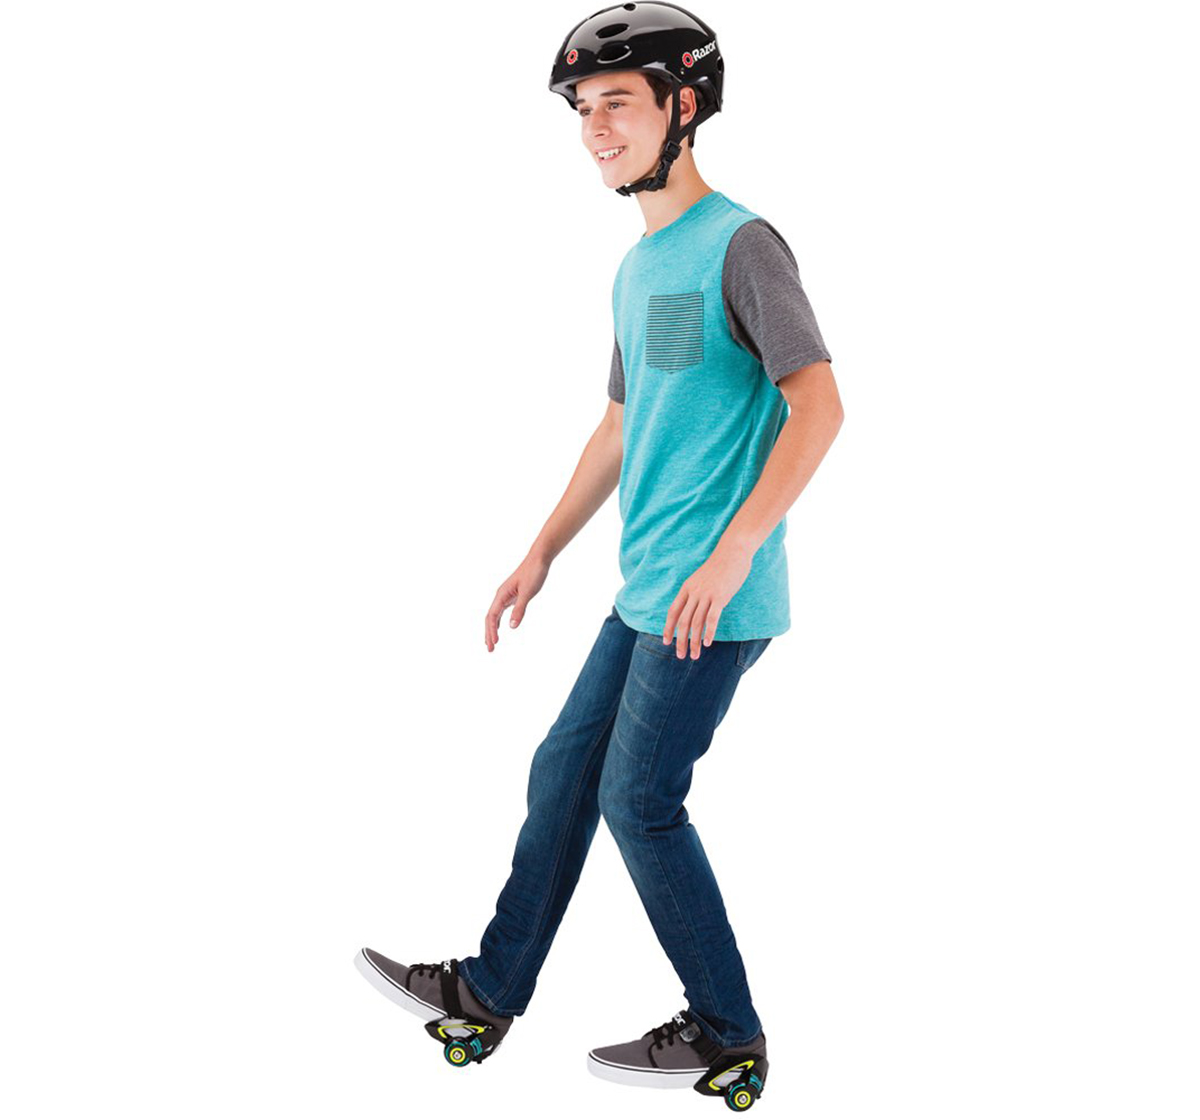 Razor | Razor Jetts Heel Wheels - Green Skates and Skateboards for Kids age 8Y+ (Green)